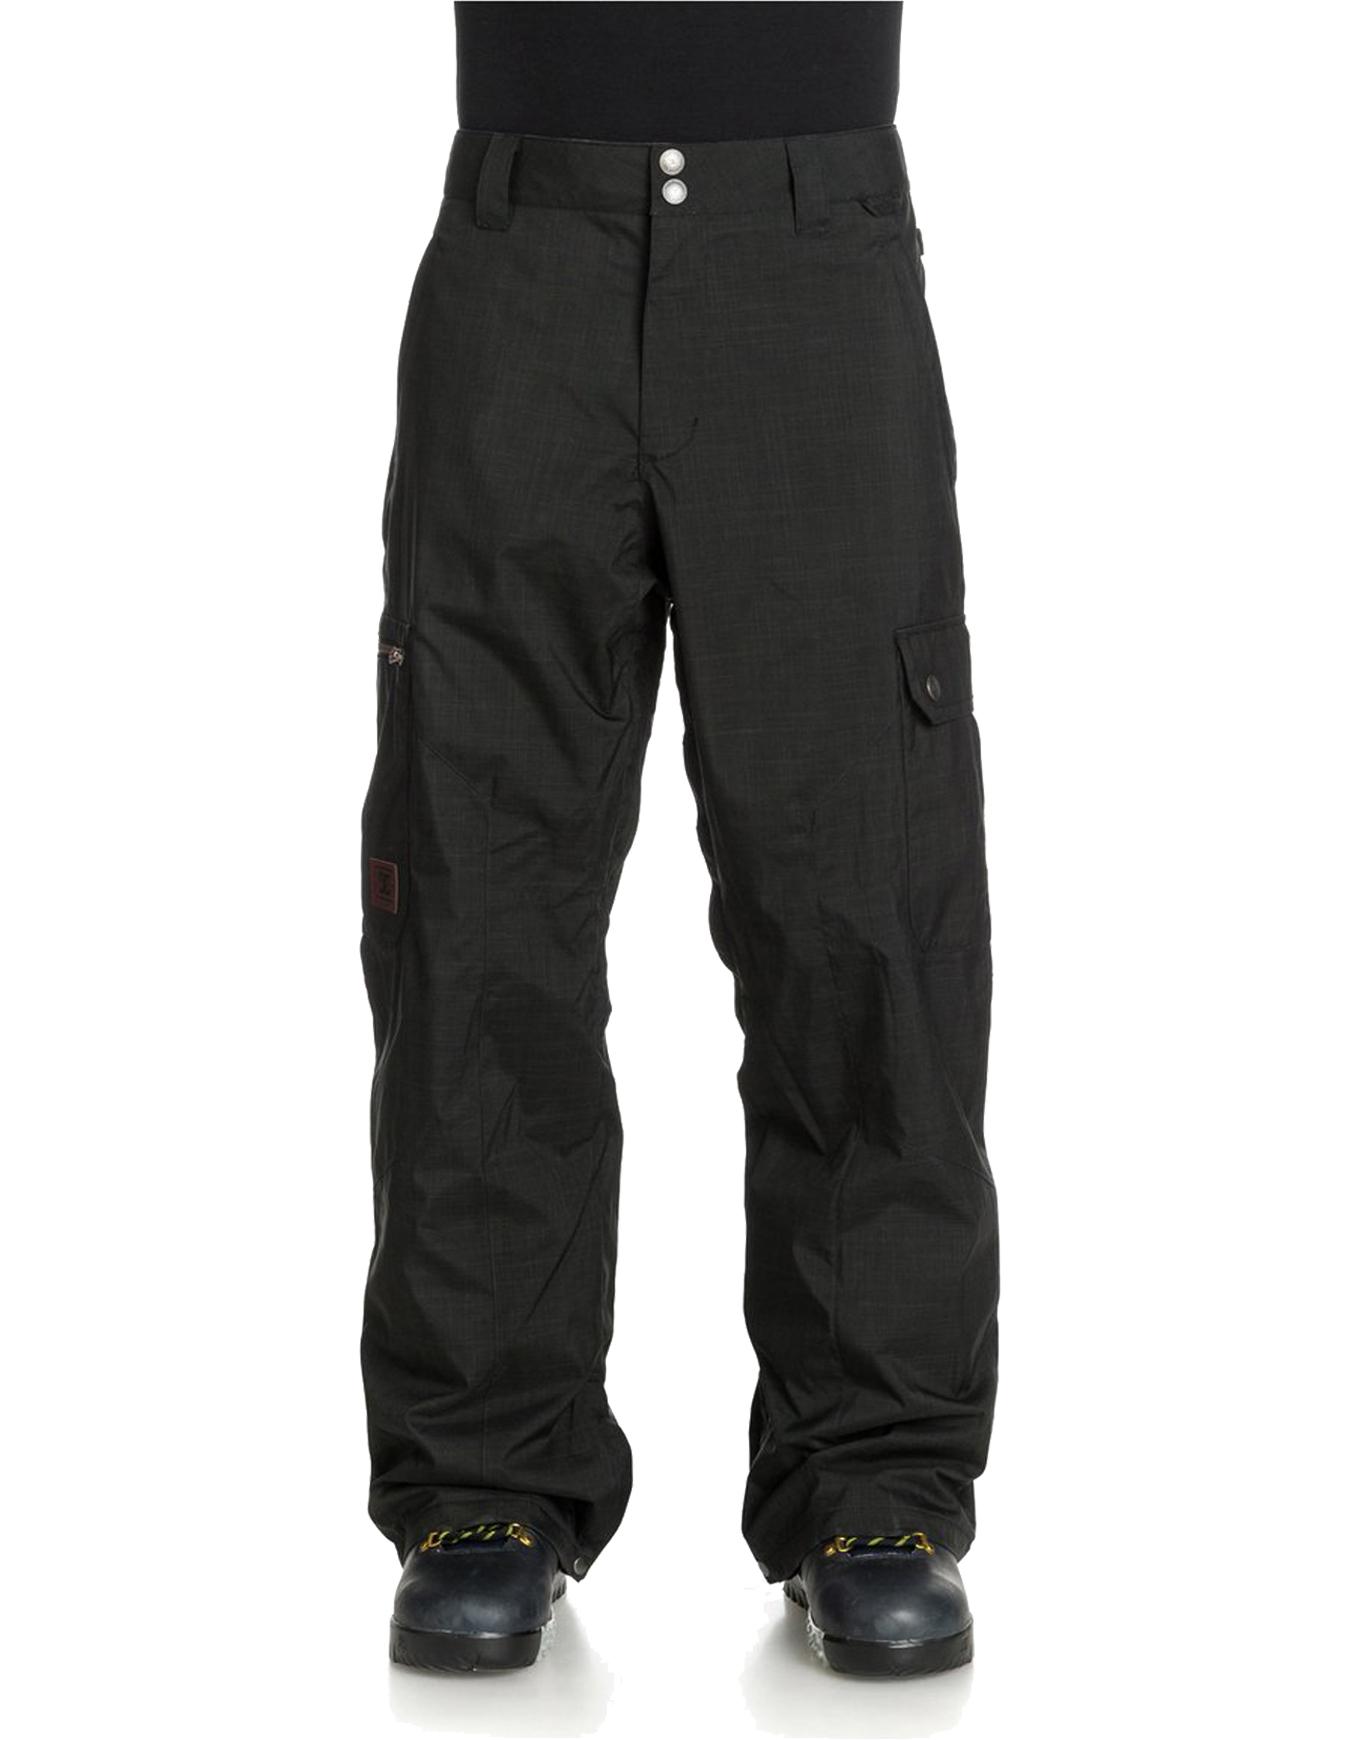 De Combinaison Pantalon Homme Pantalons Ski Snow RdwwqCU